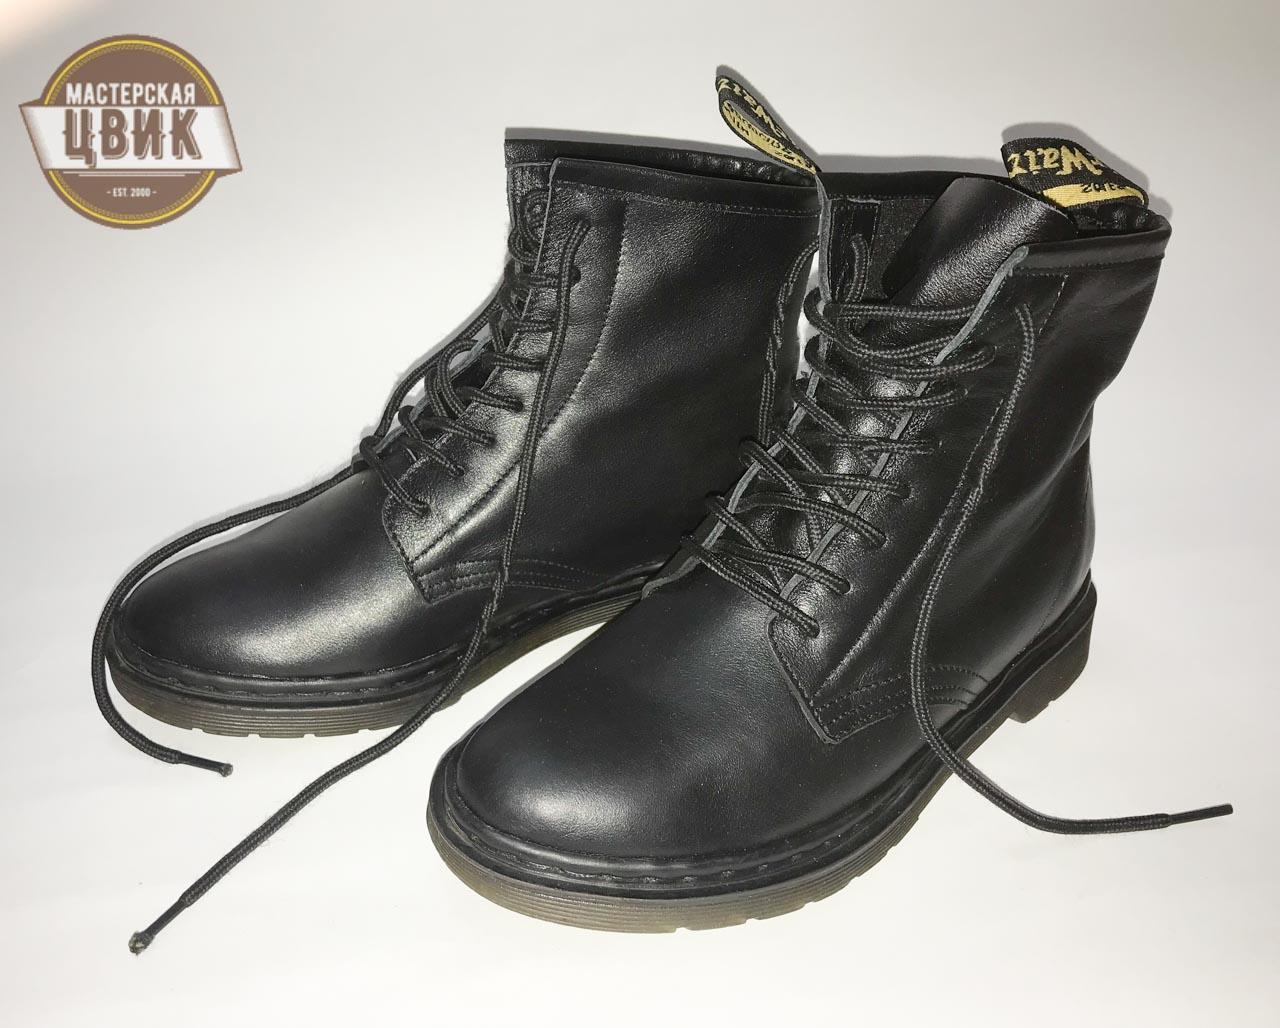 individualnyj-poshiv-obuvi-minsk-68 Индивидуальный пошив обуви